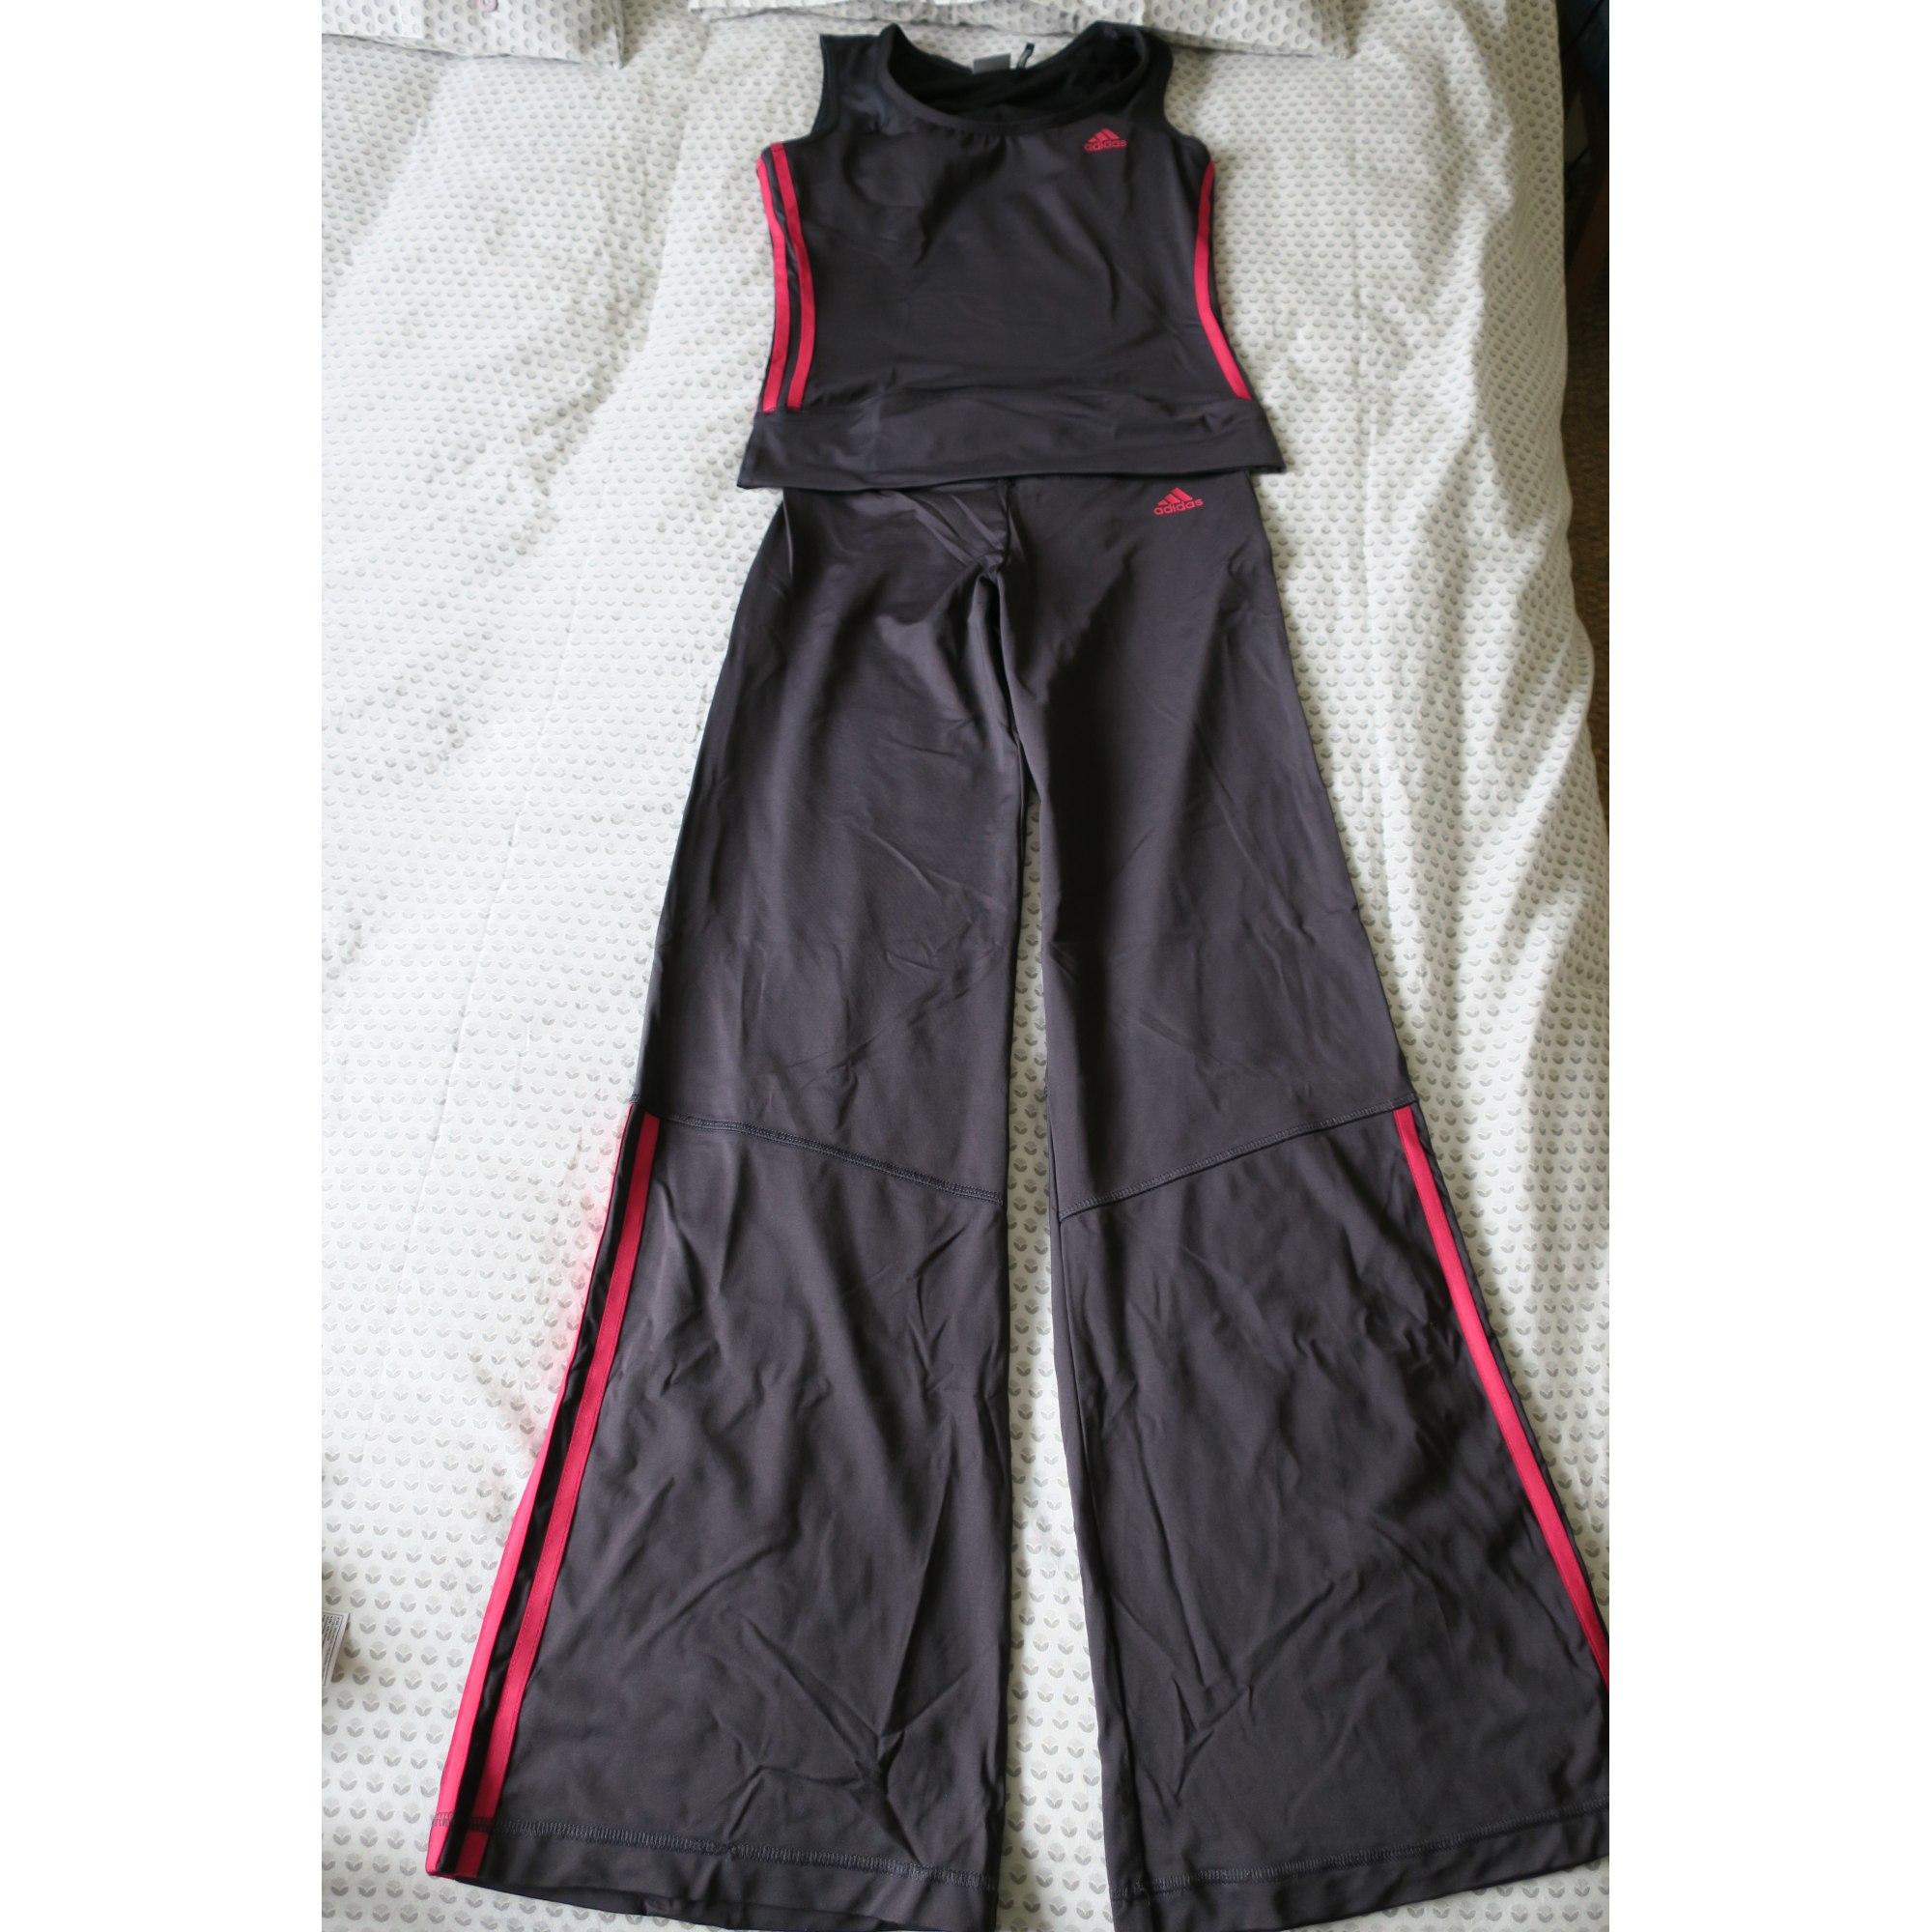 Fitness s De Adidas Gris 5581974 36 T1 Pantalon Pqv7wUq